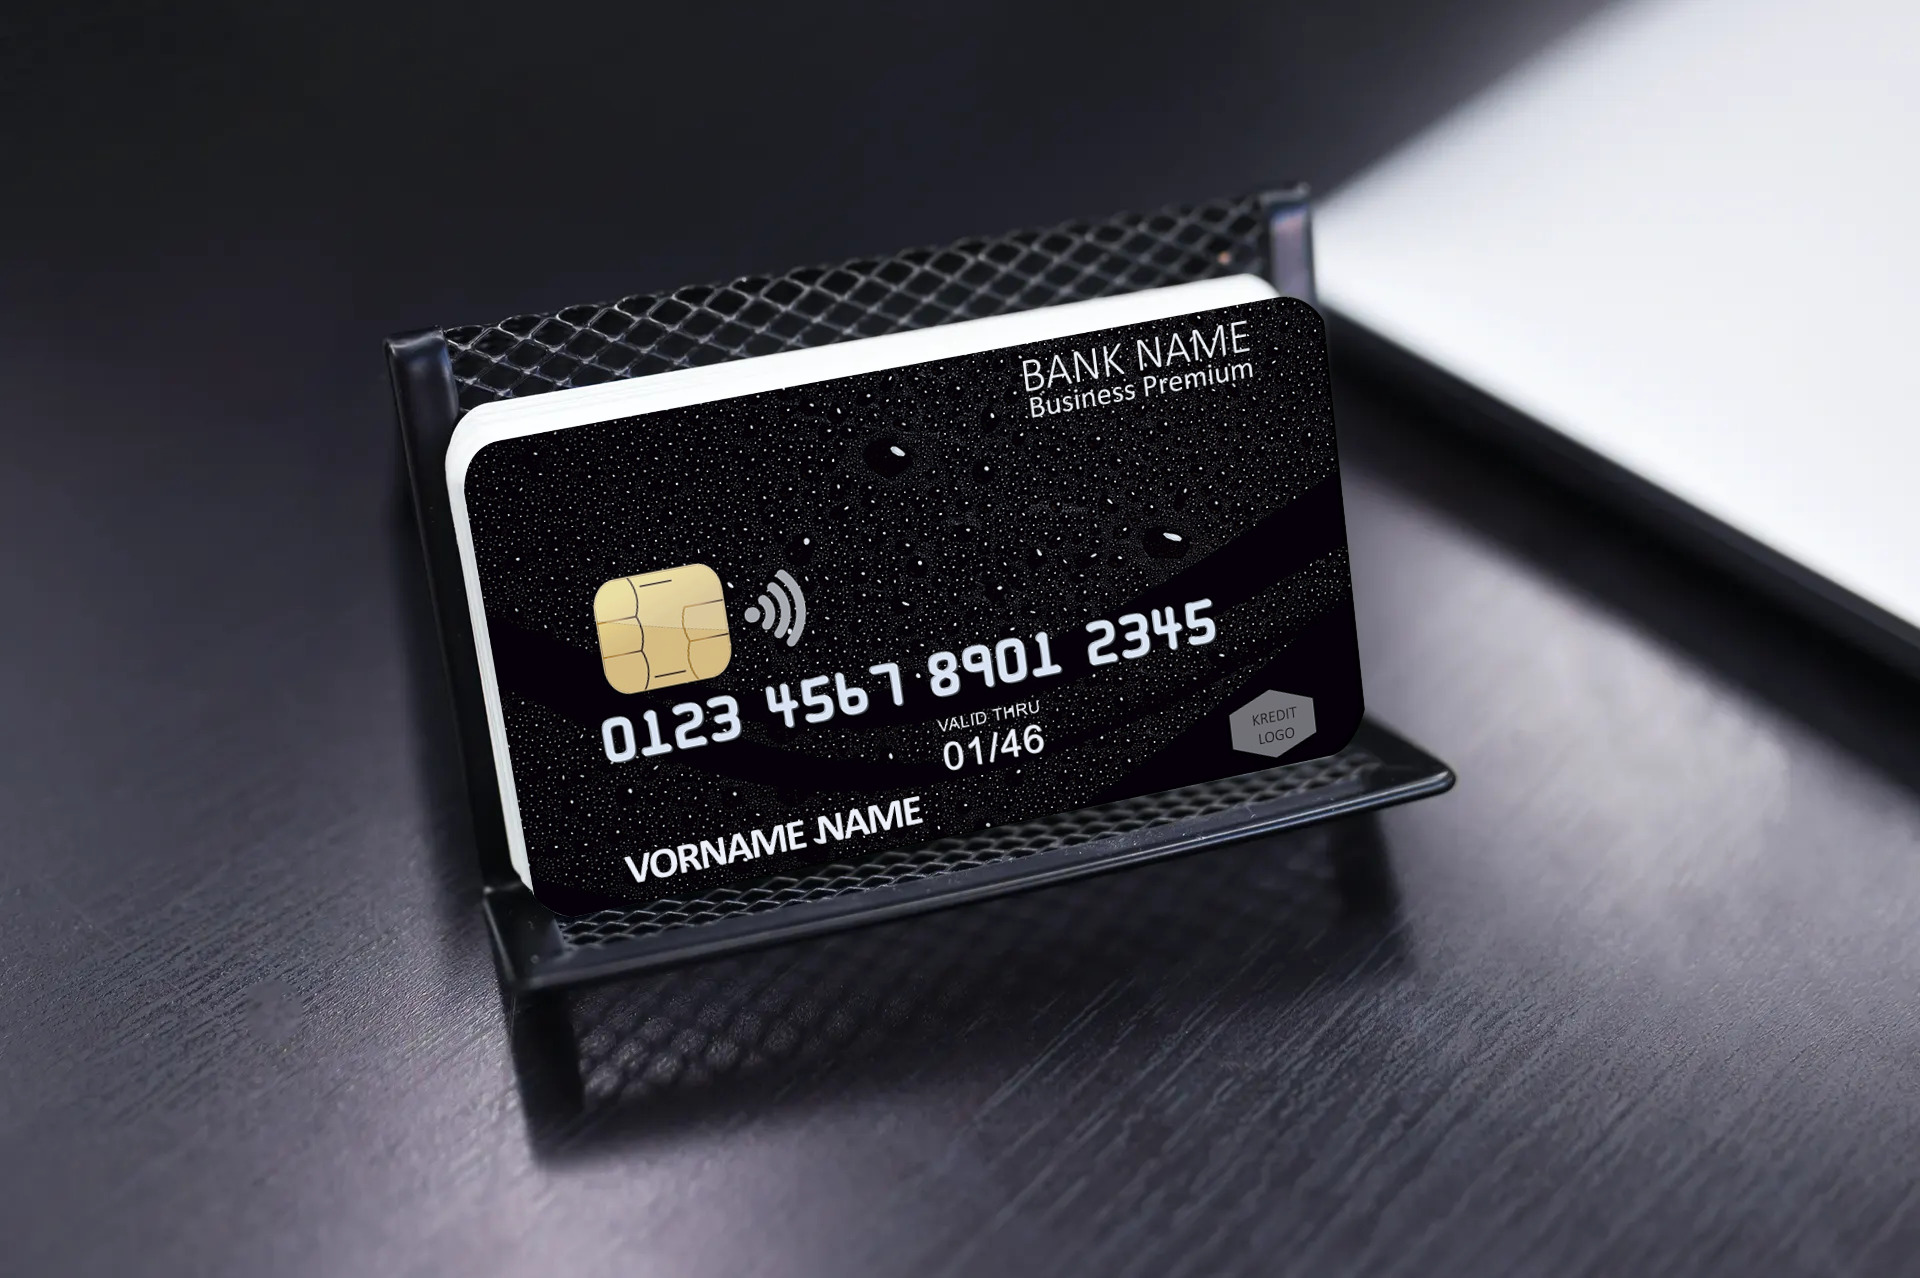 Kreditkarte Designvorlage KC-2019-000109 - TEXTAG GROUP